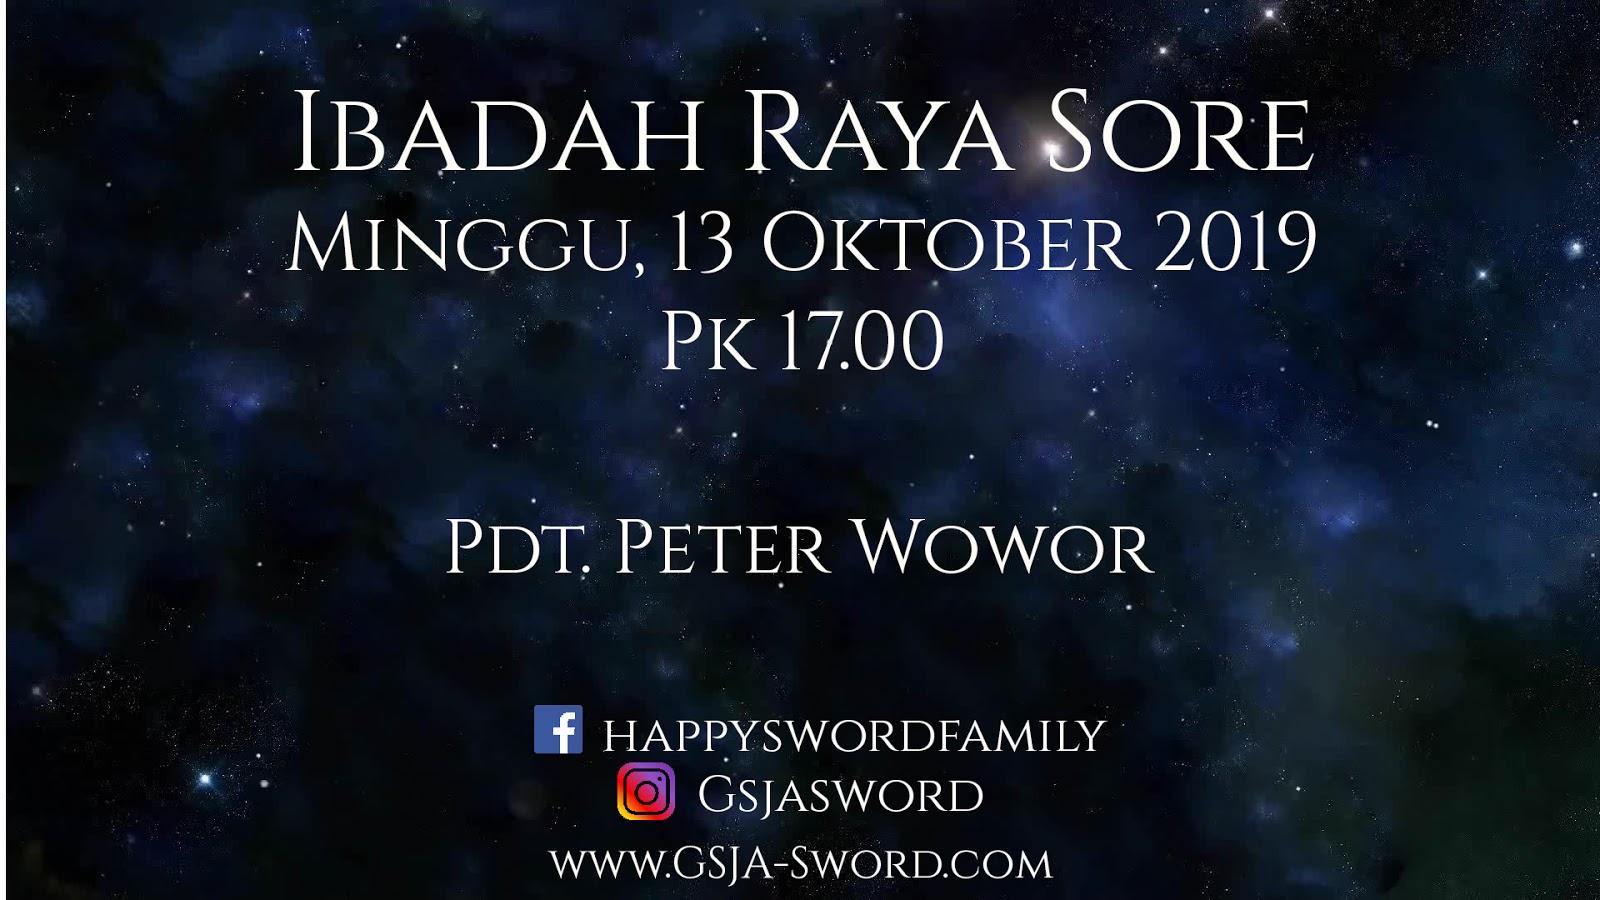 Ibadah Raya Sore GSJA Sword 13 Oktober 2019 Jam 17.00 WIB